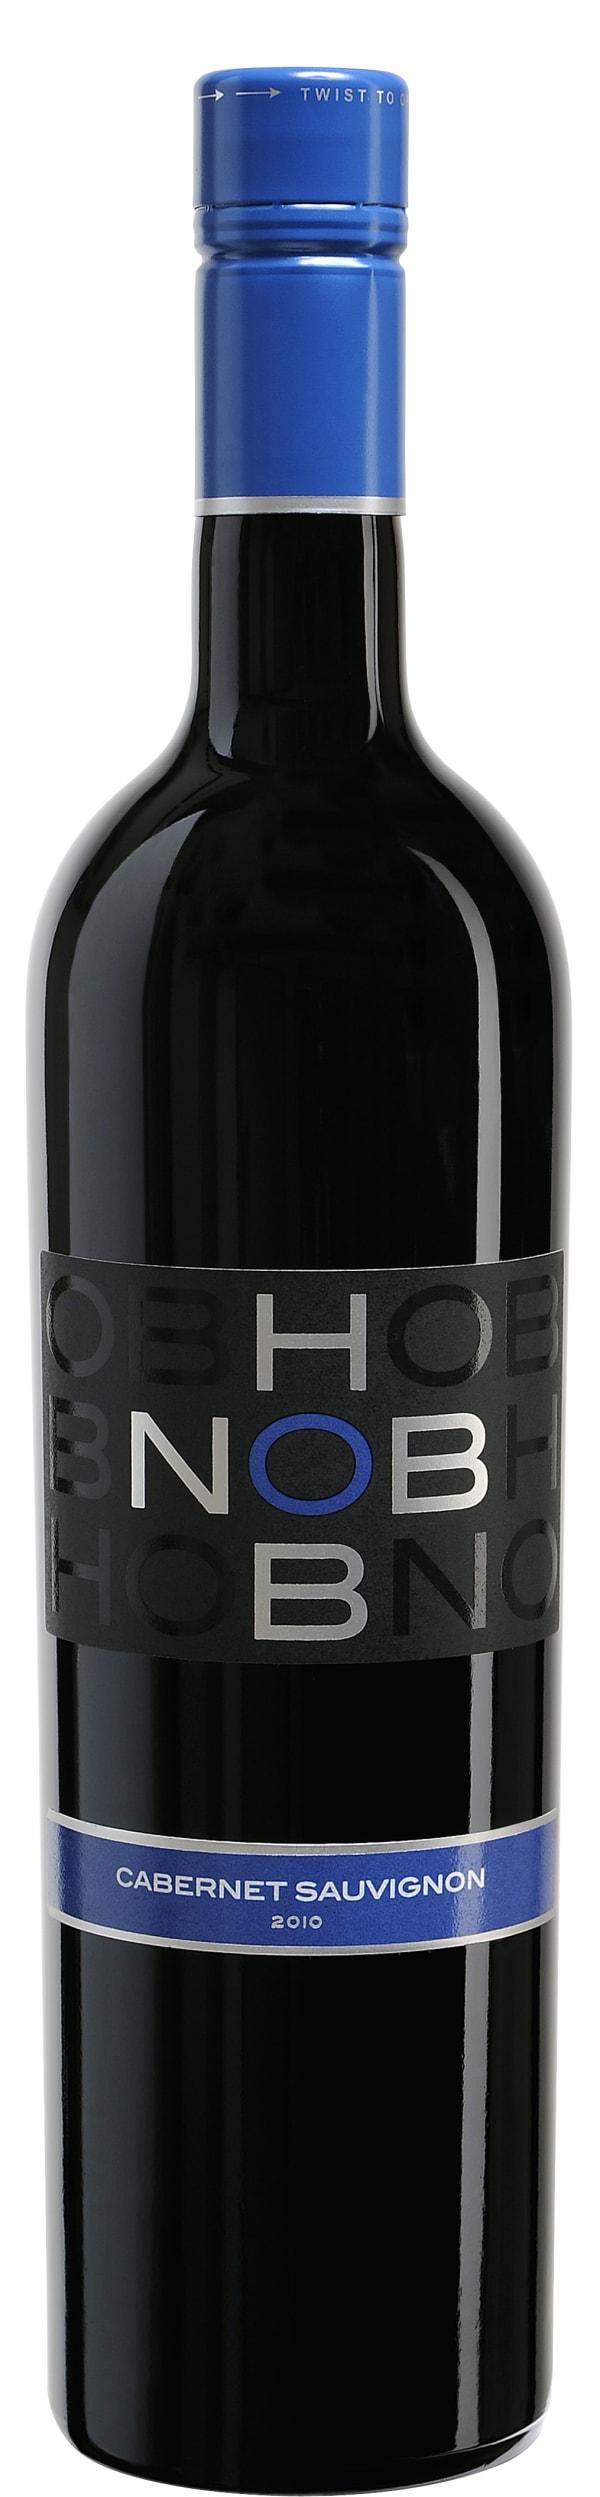 Hob Nob Cabernet Sauvignon 2015